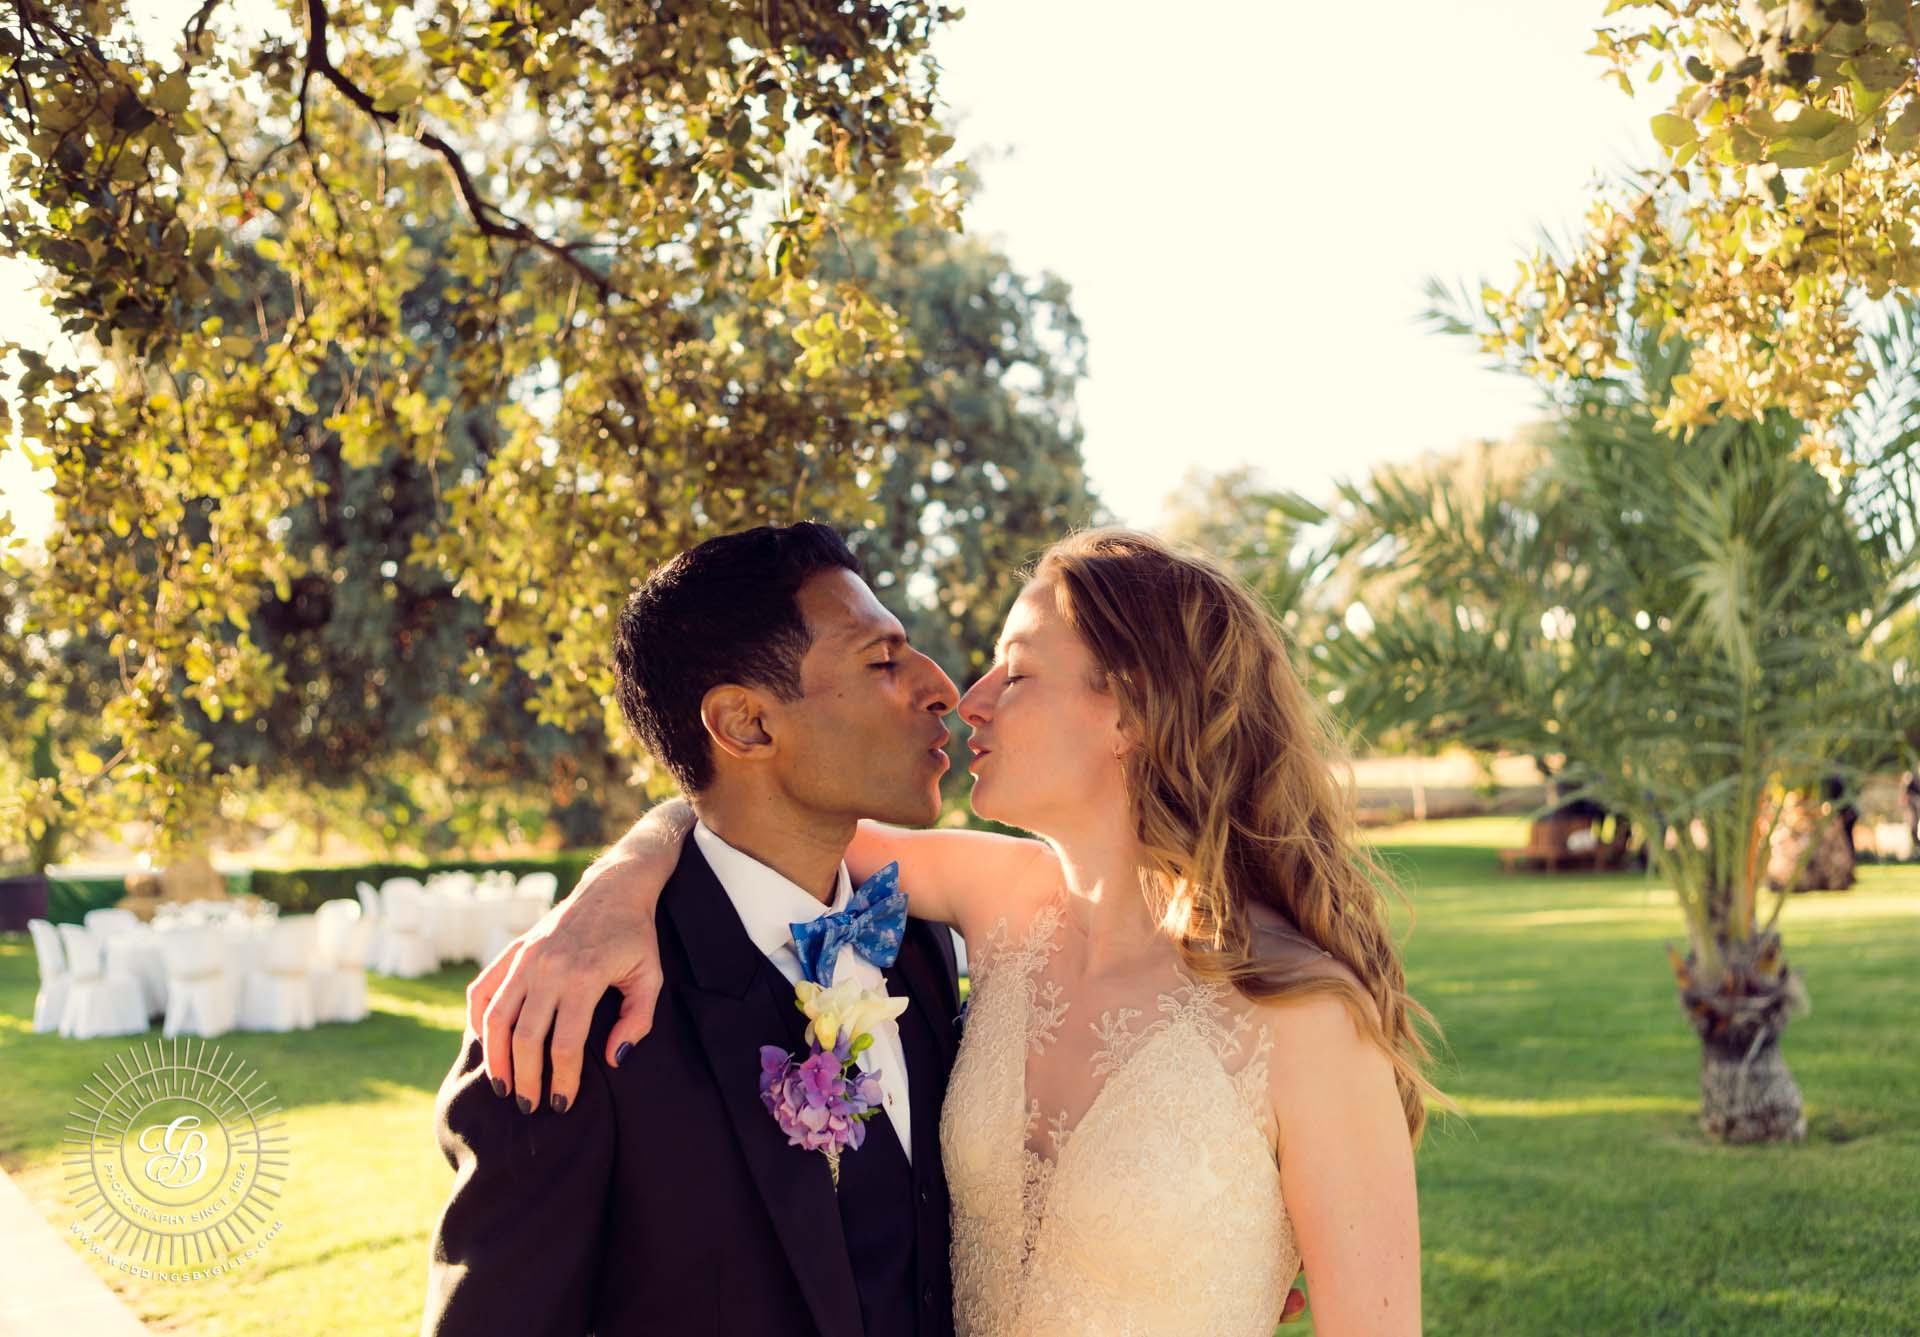 lovers kiss at garden wedding in spain